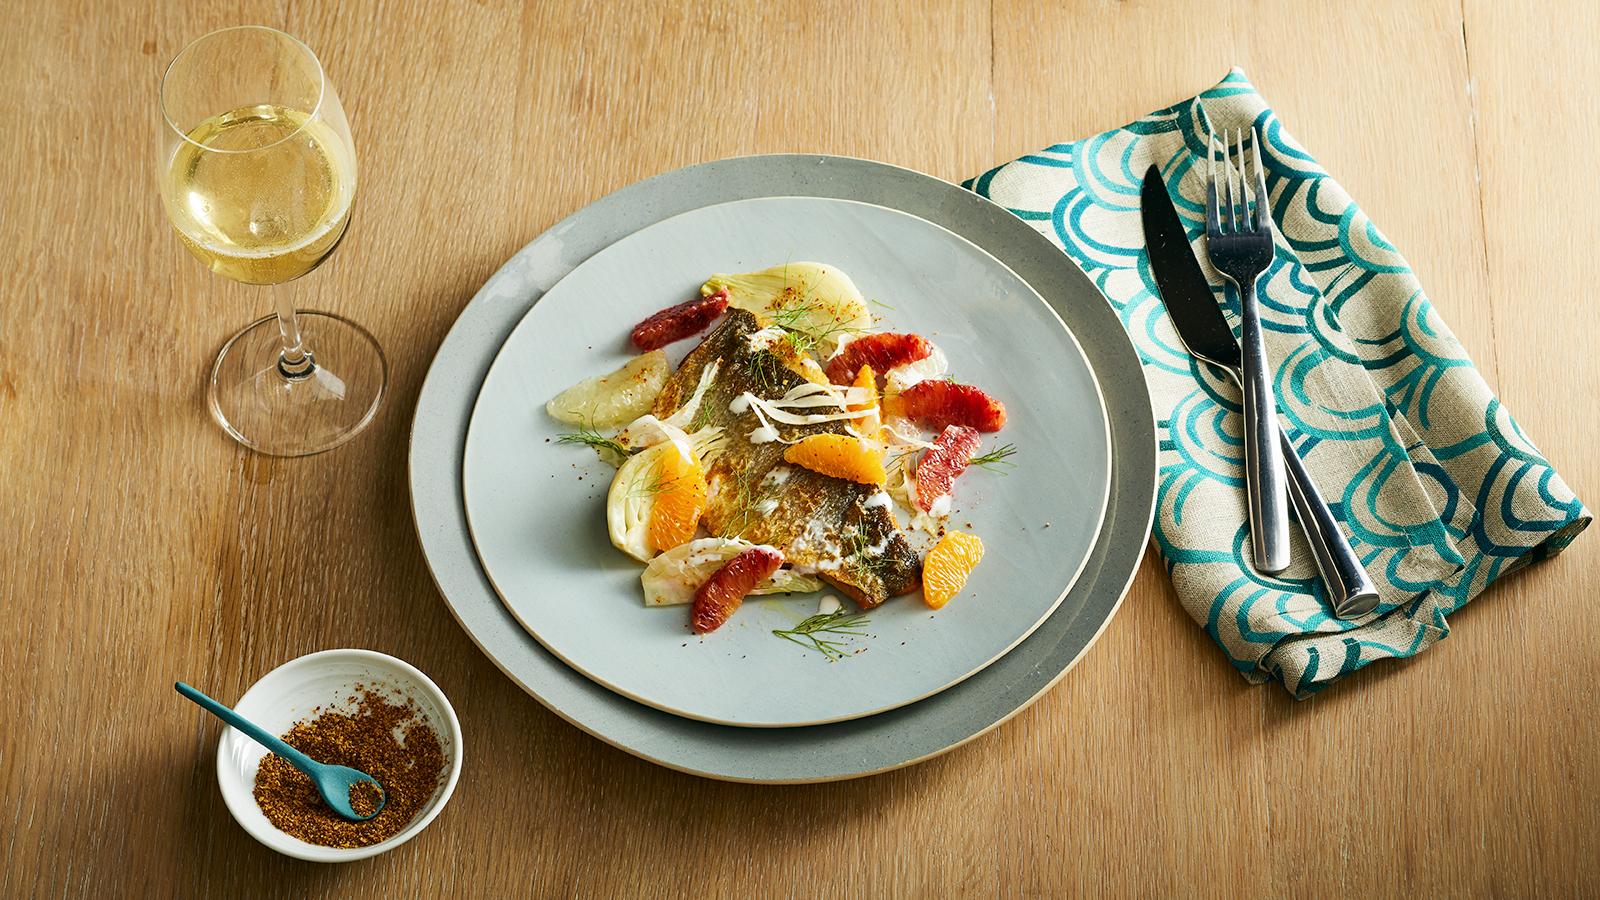 Perfect Match Recipe: Seared Branzino With Winter Citrus, Fennel & Yogurt photo